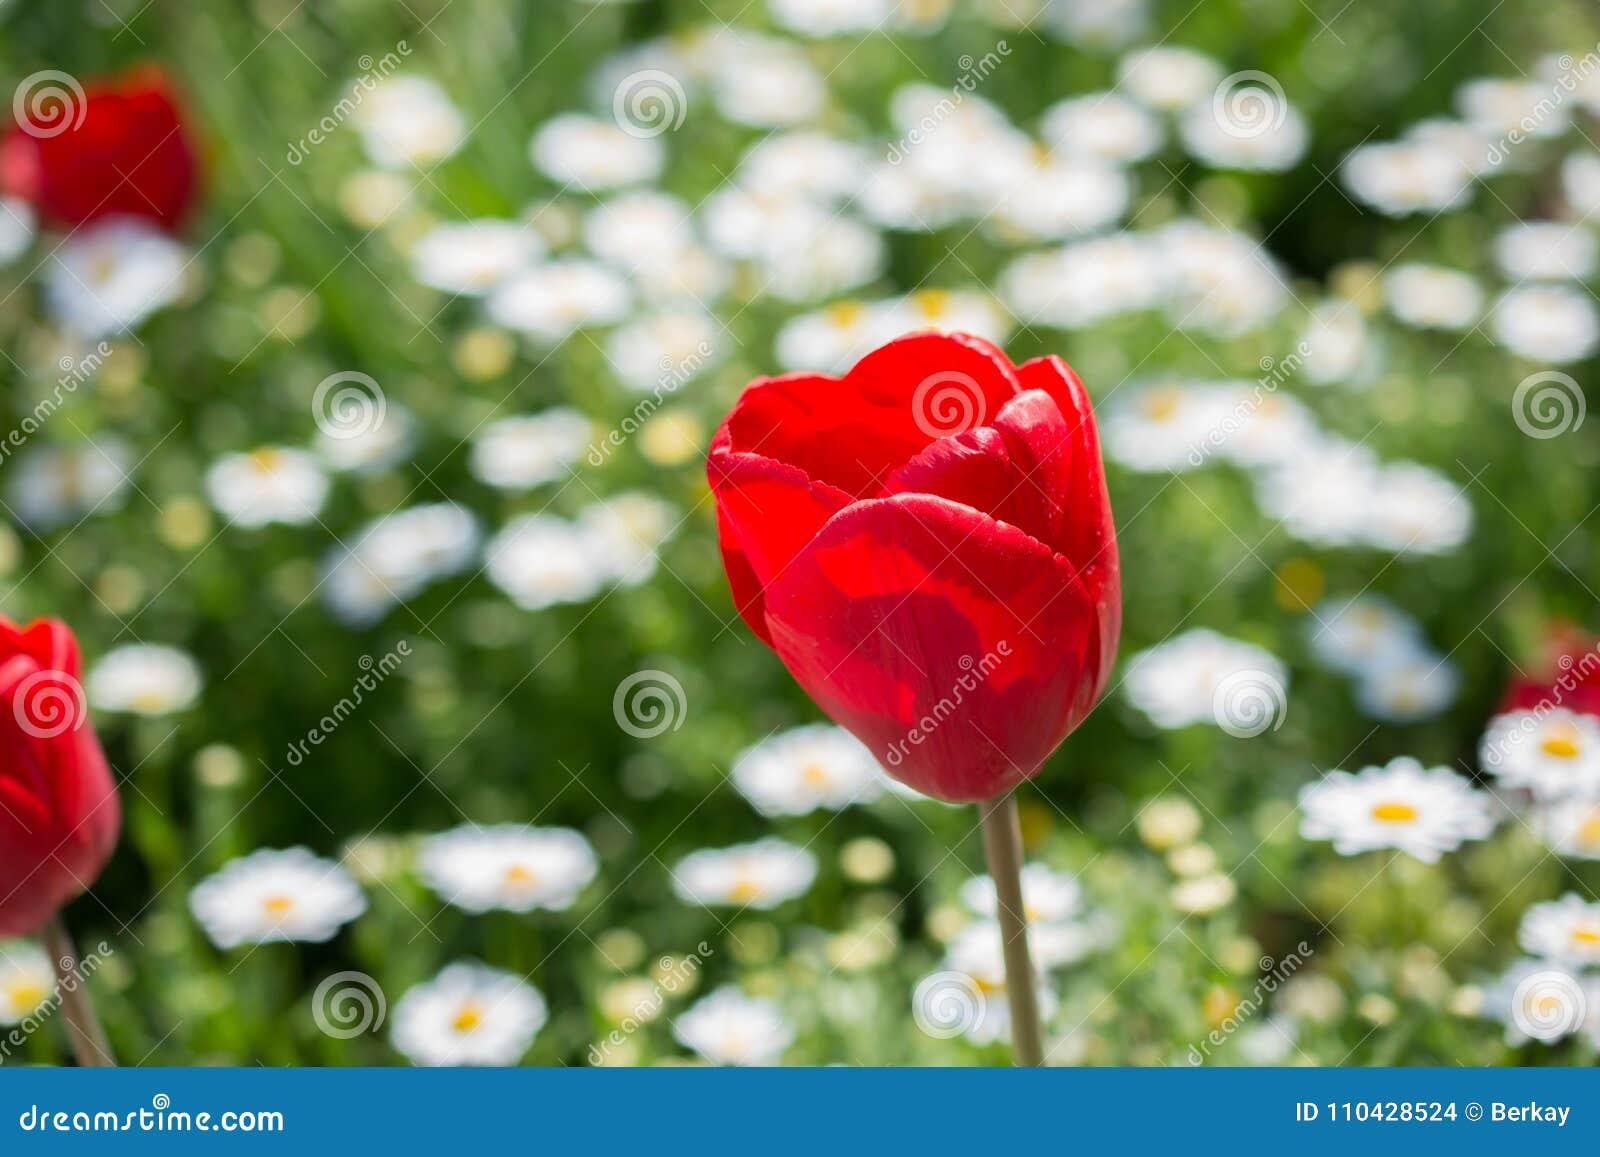 Single Tulip Flower In Spring Season Stock Photo Image Of